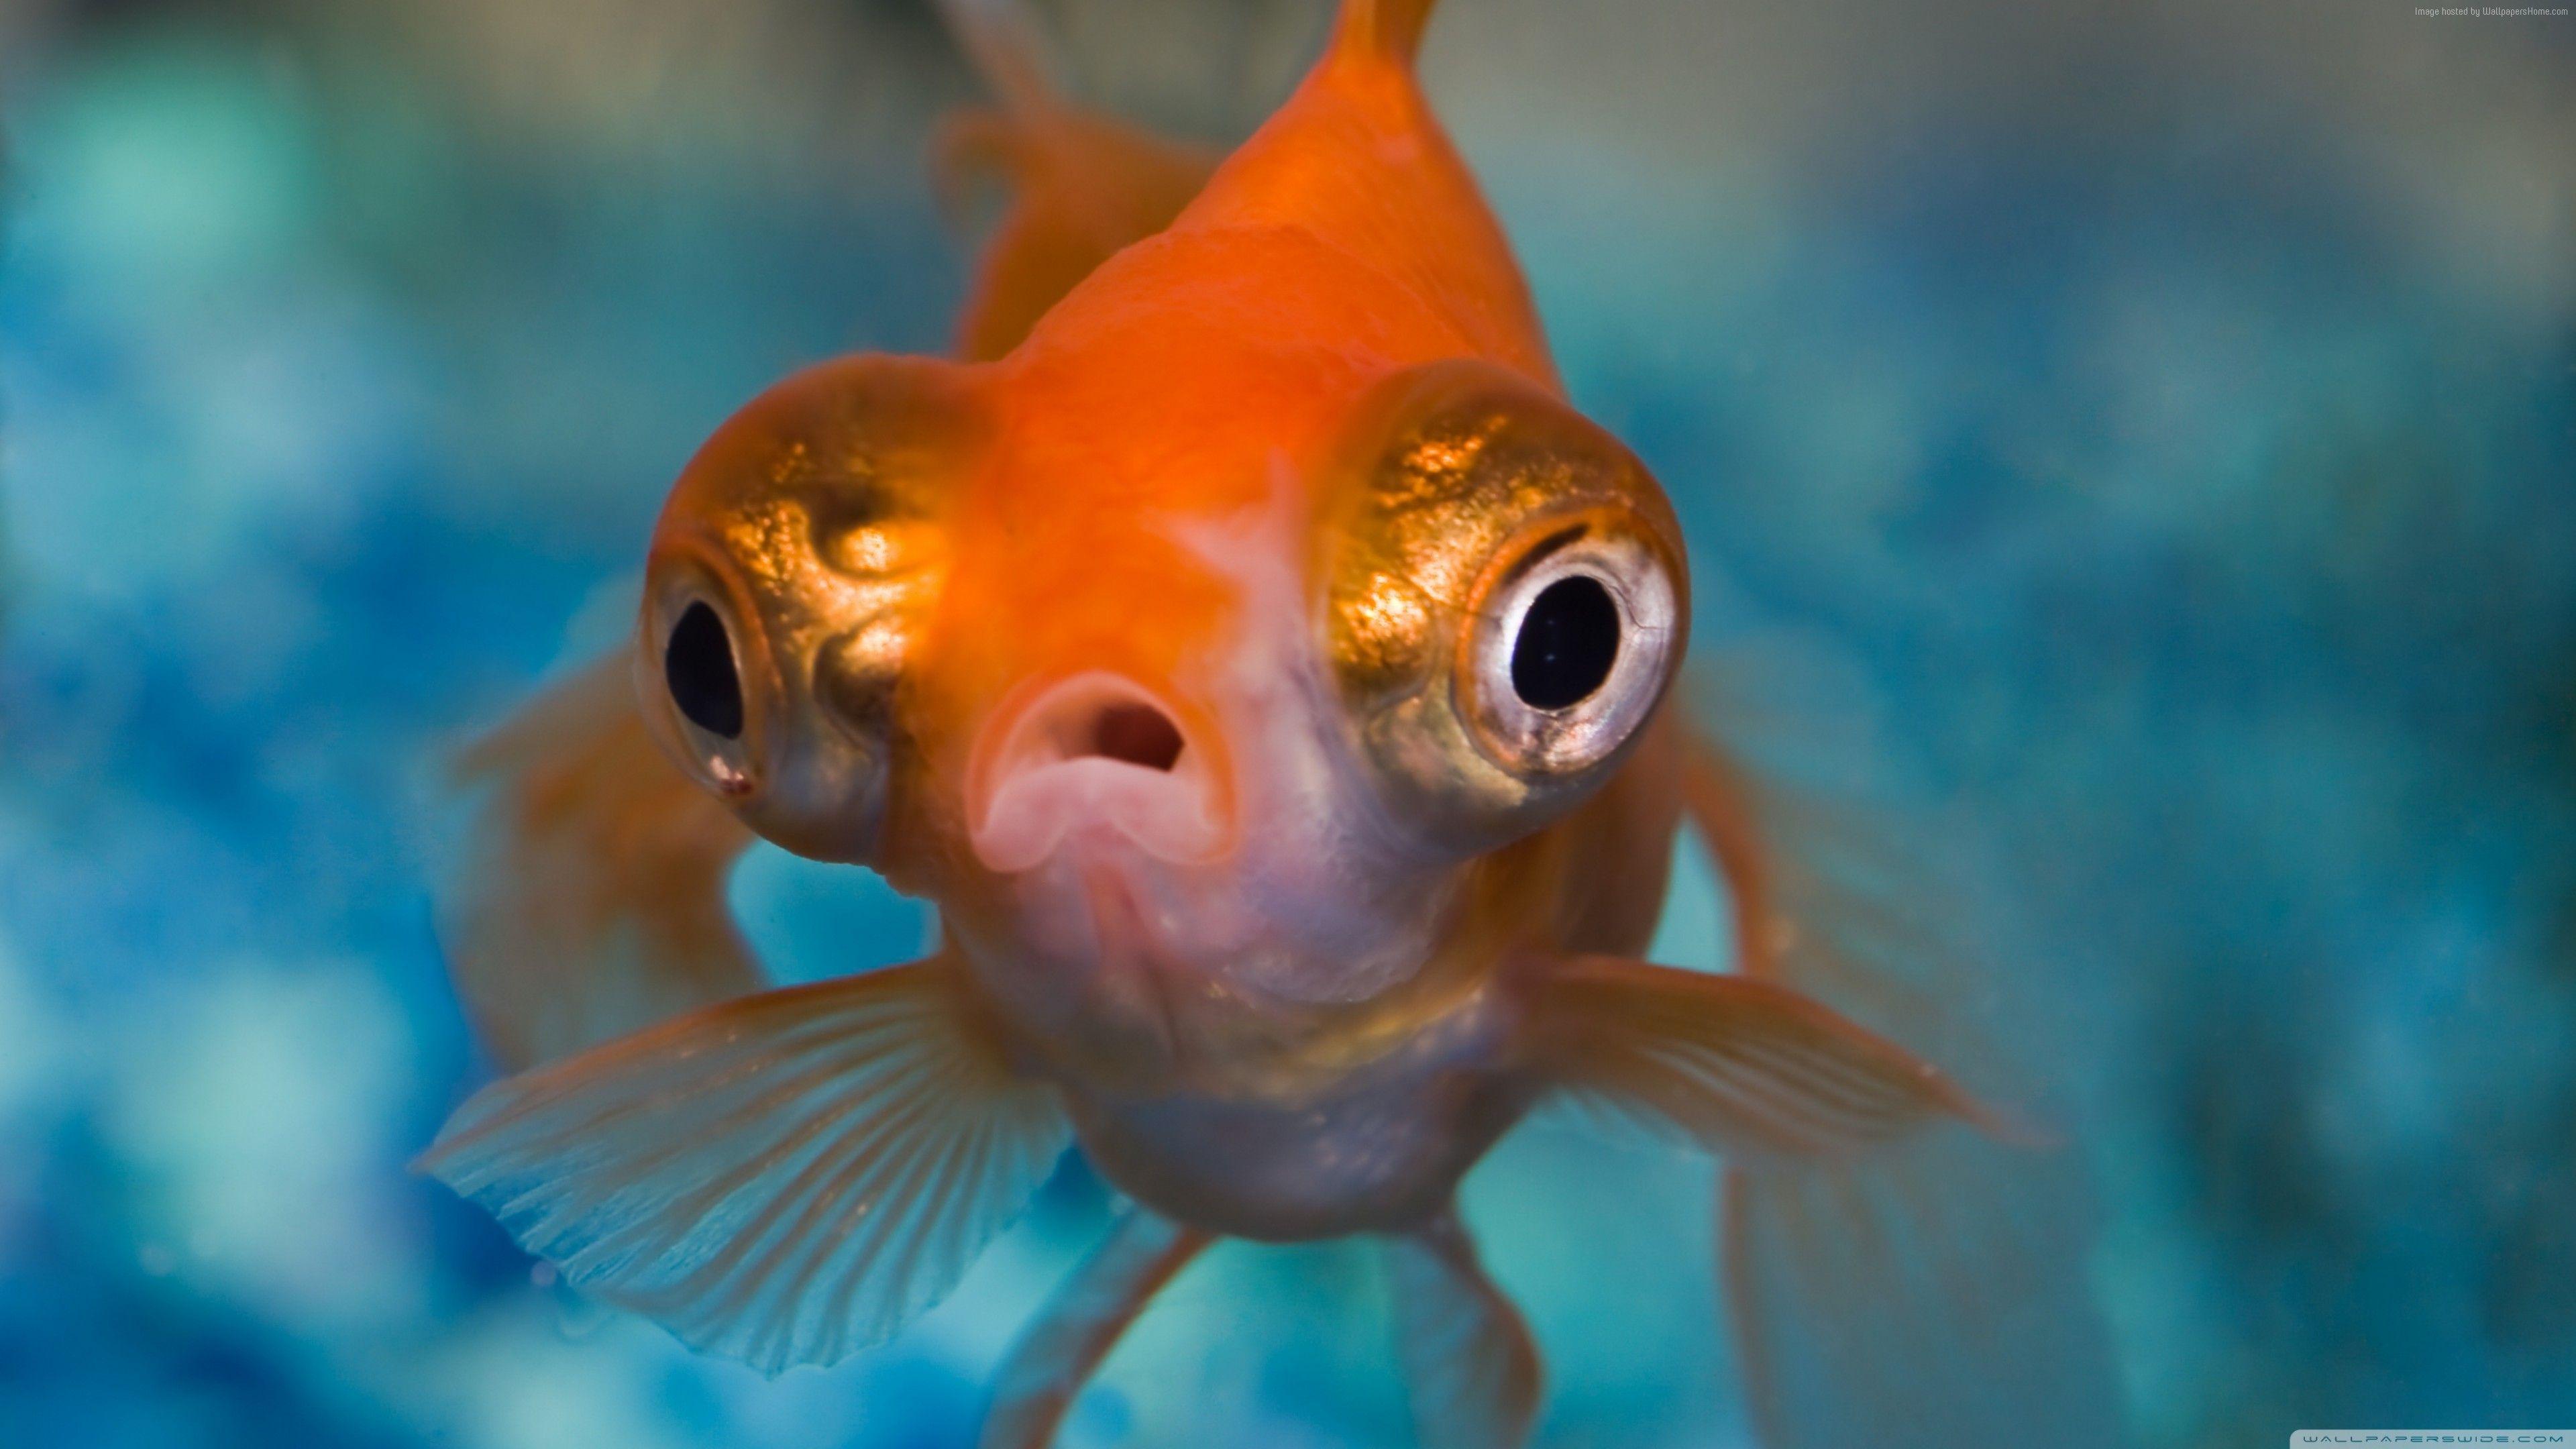 Aquaticecosystem Aquaticlife Fish Goldfish Nature Oceananimals Photography Sealife Telescope Underwaterphoto Wildlife Telescope Goldfish Fish